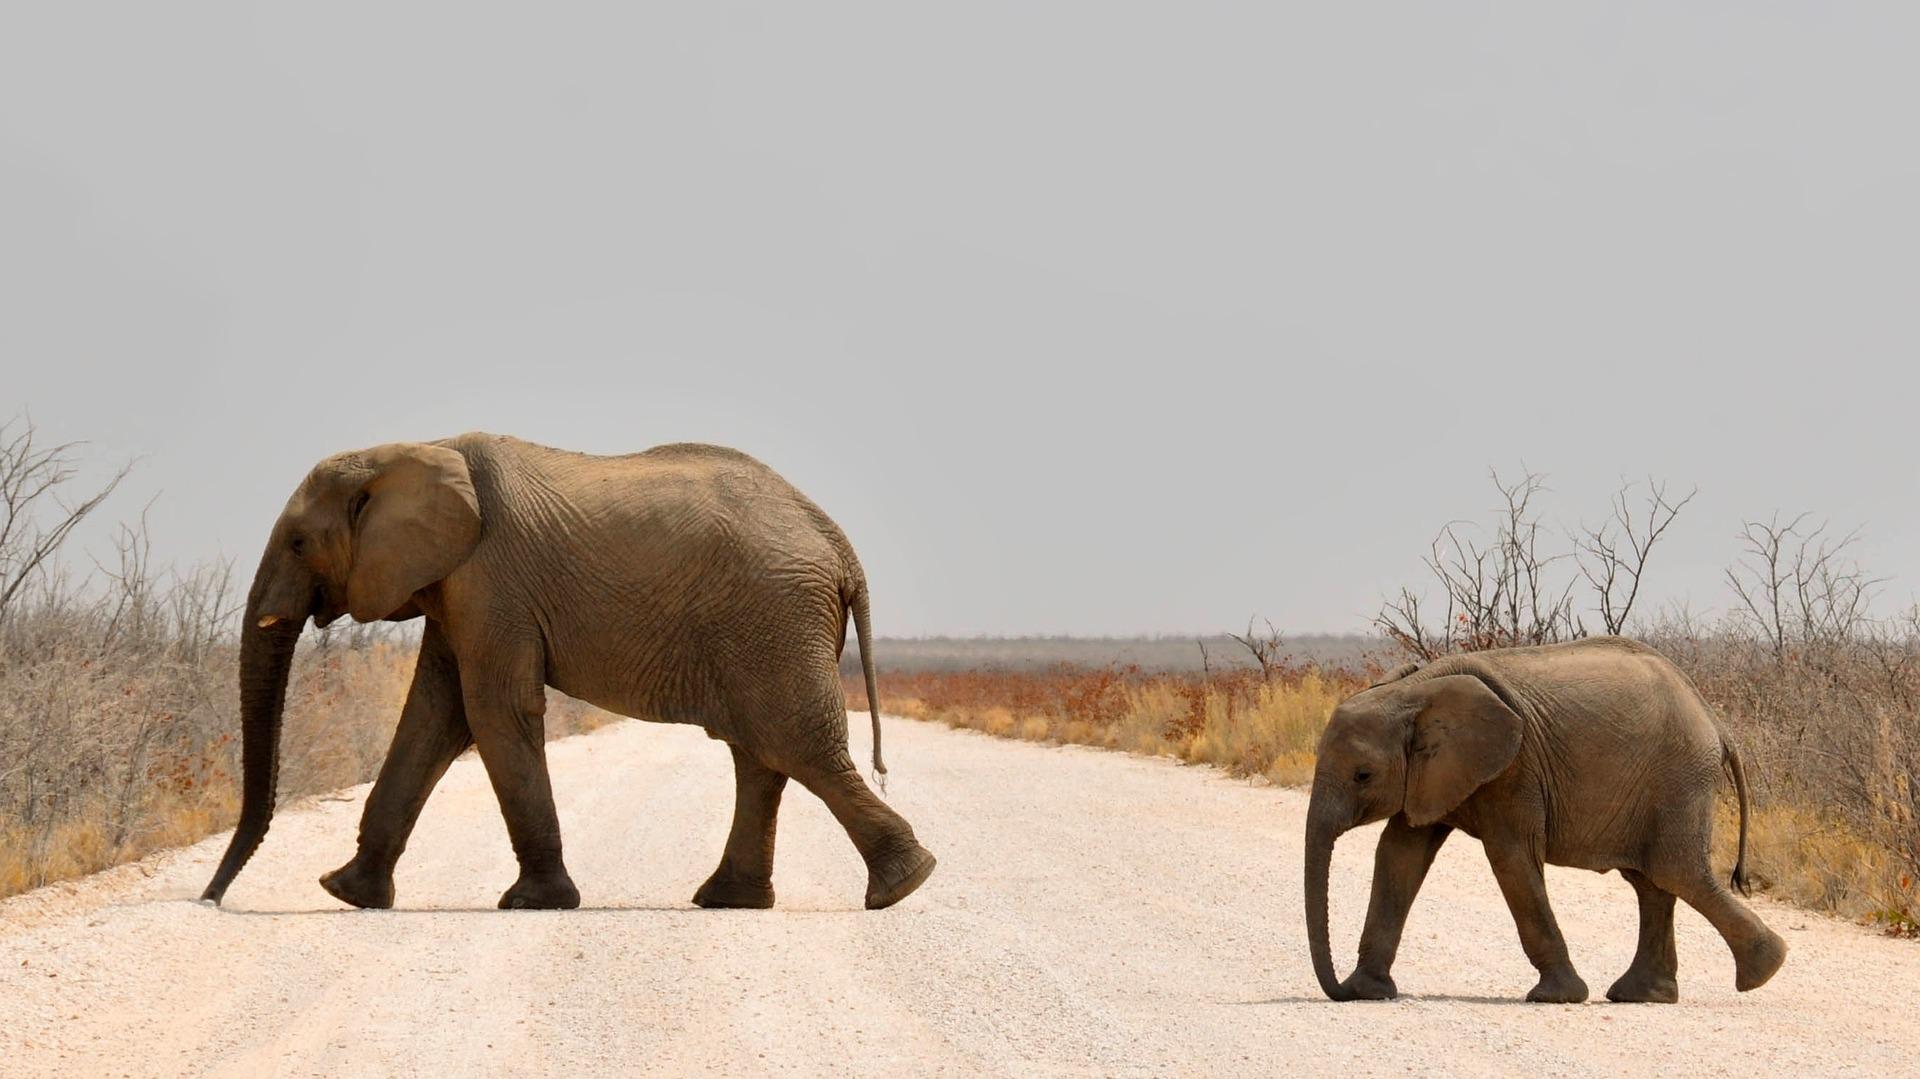 elephant-1170107_1920